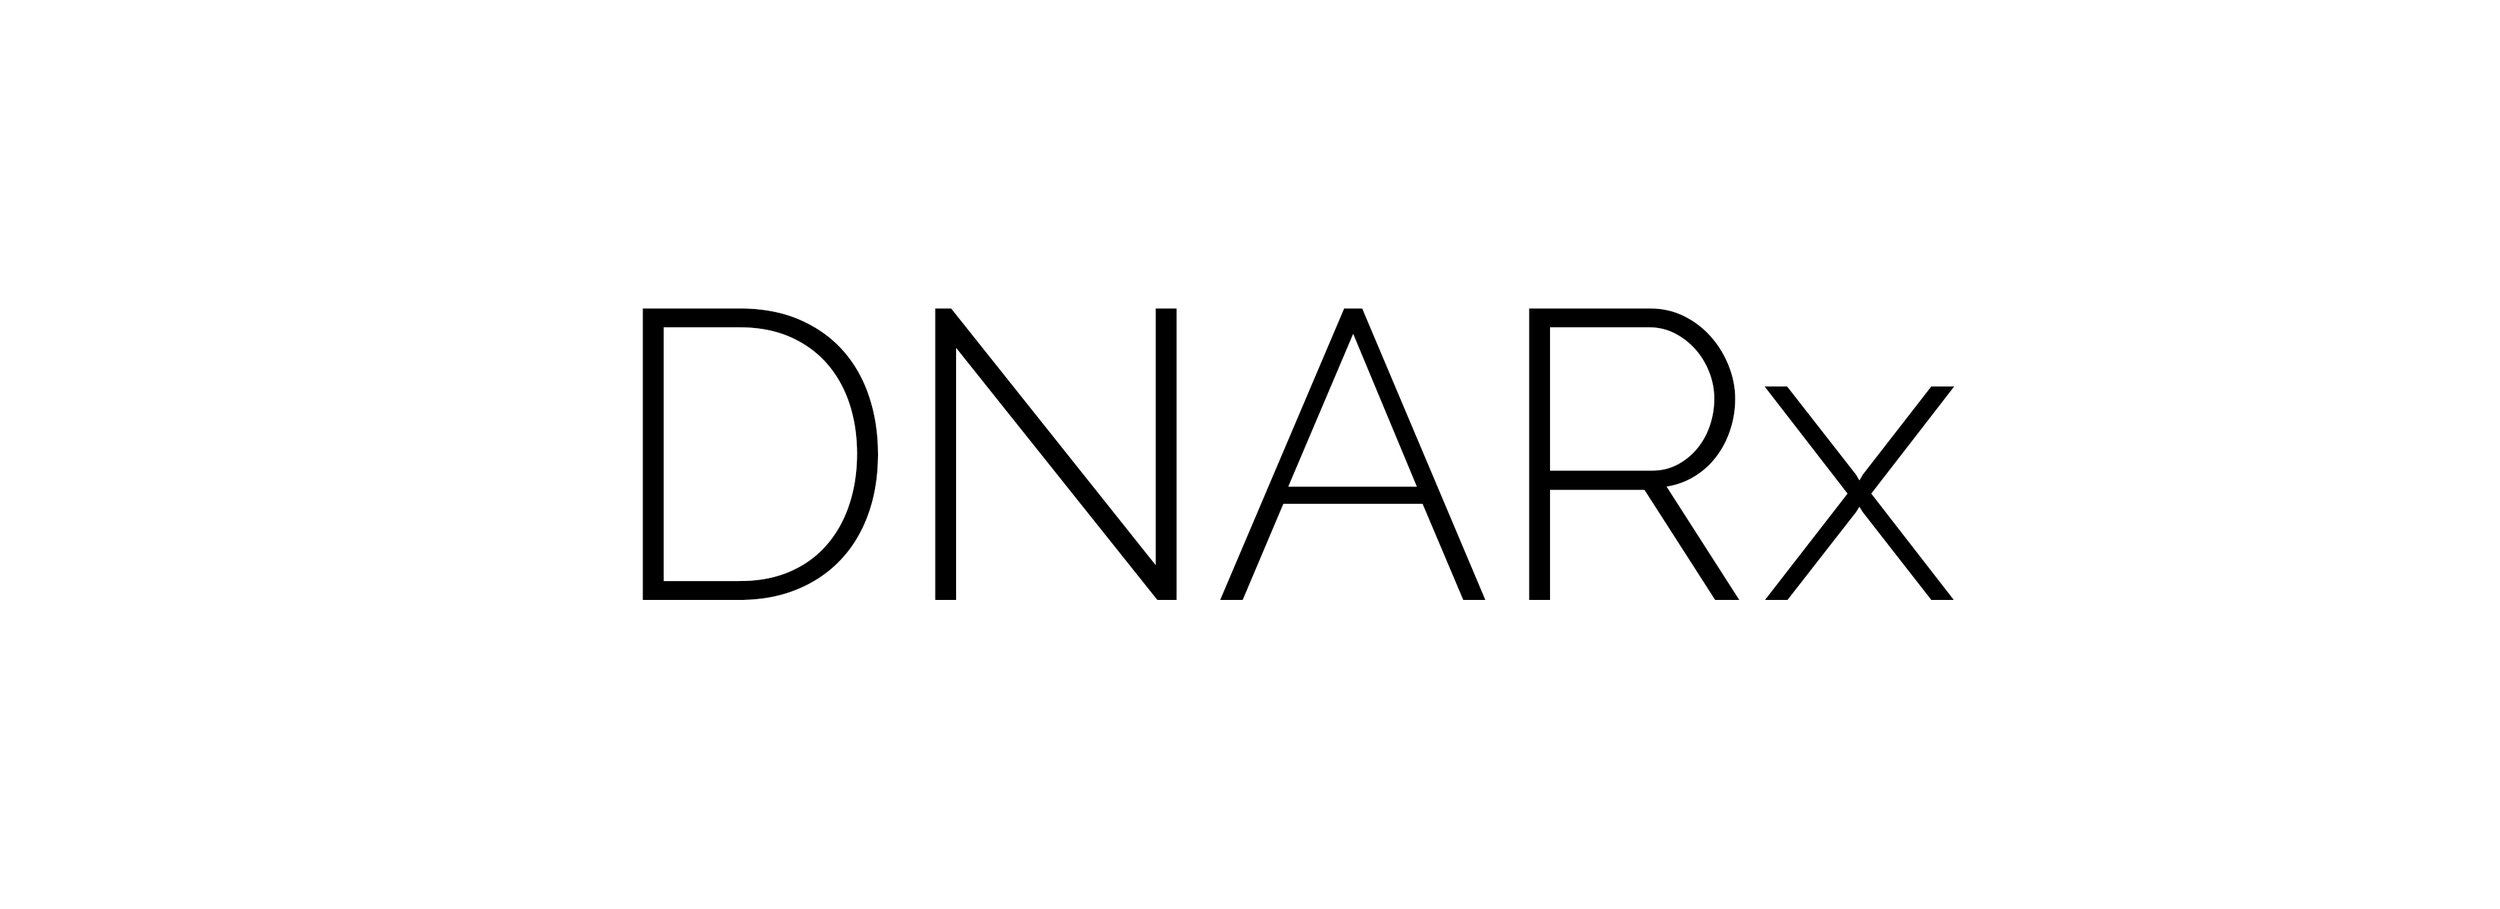 DNARx.jpg